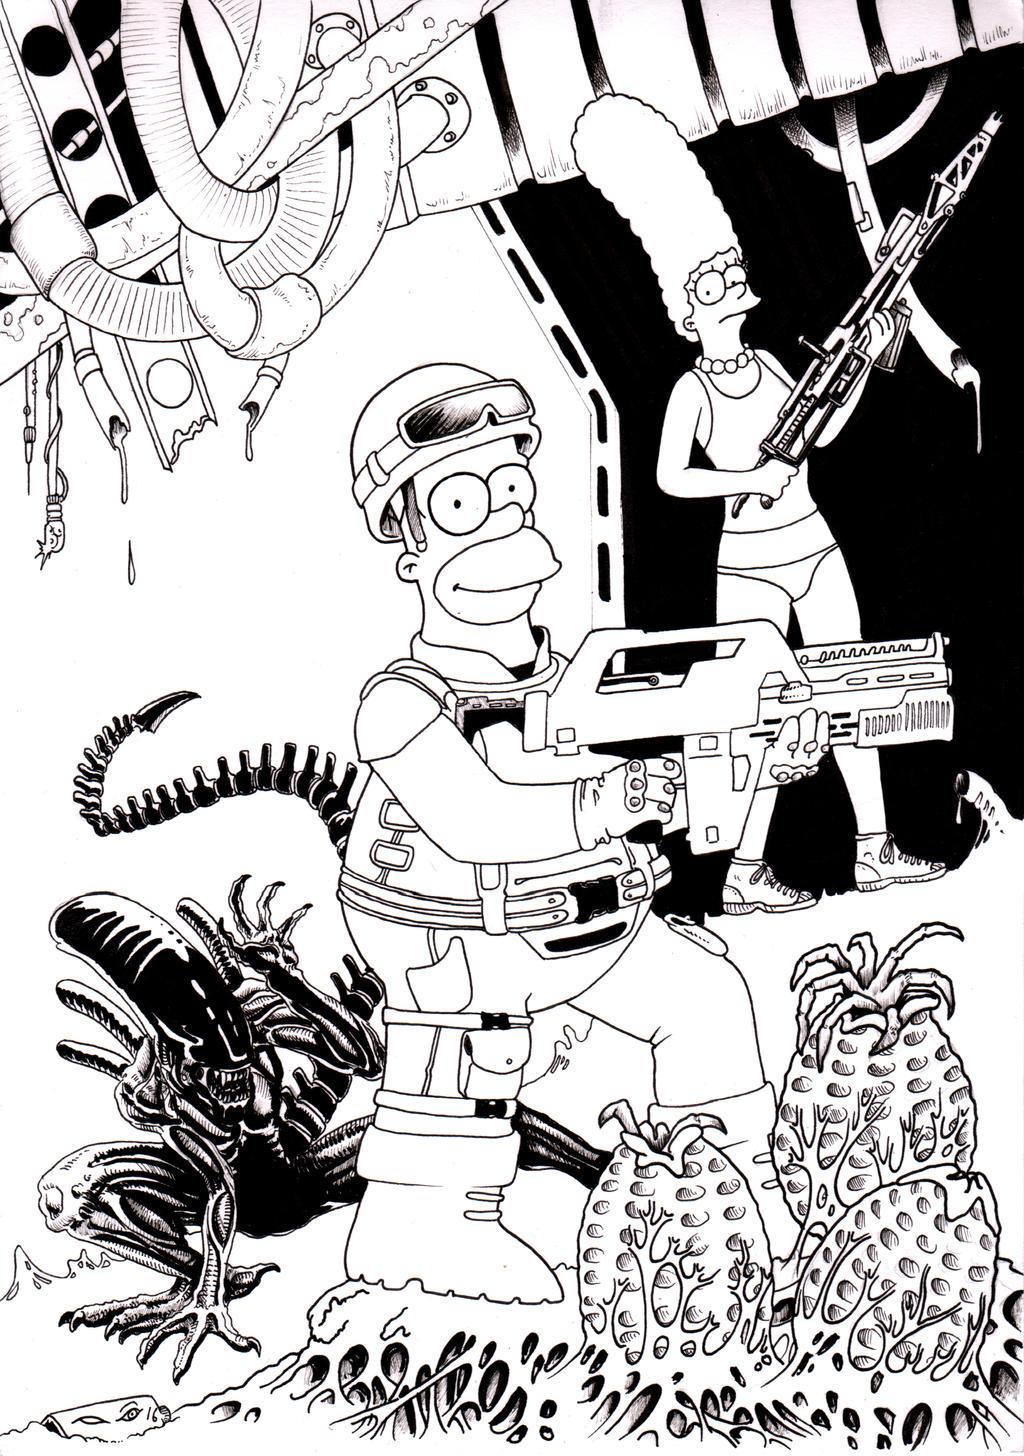 Simpsons Vs Alien by emalterre